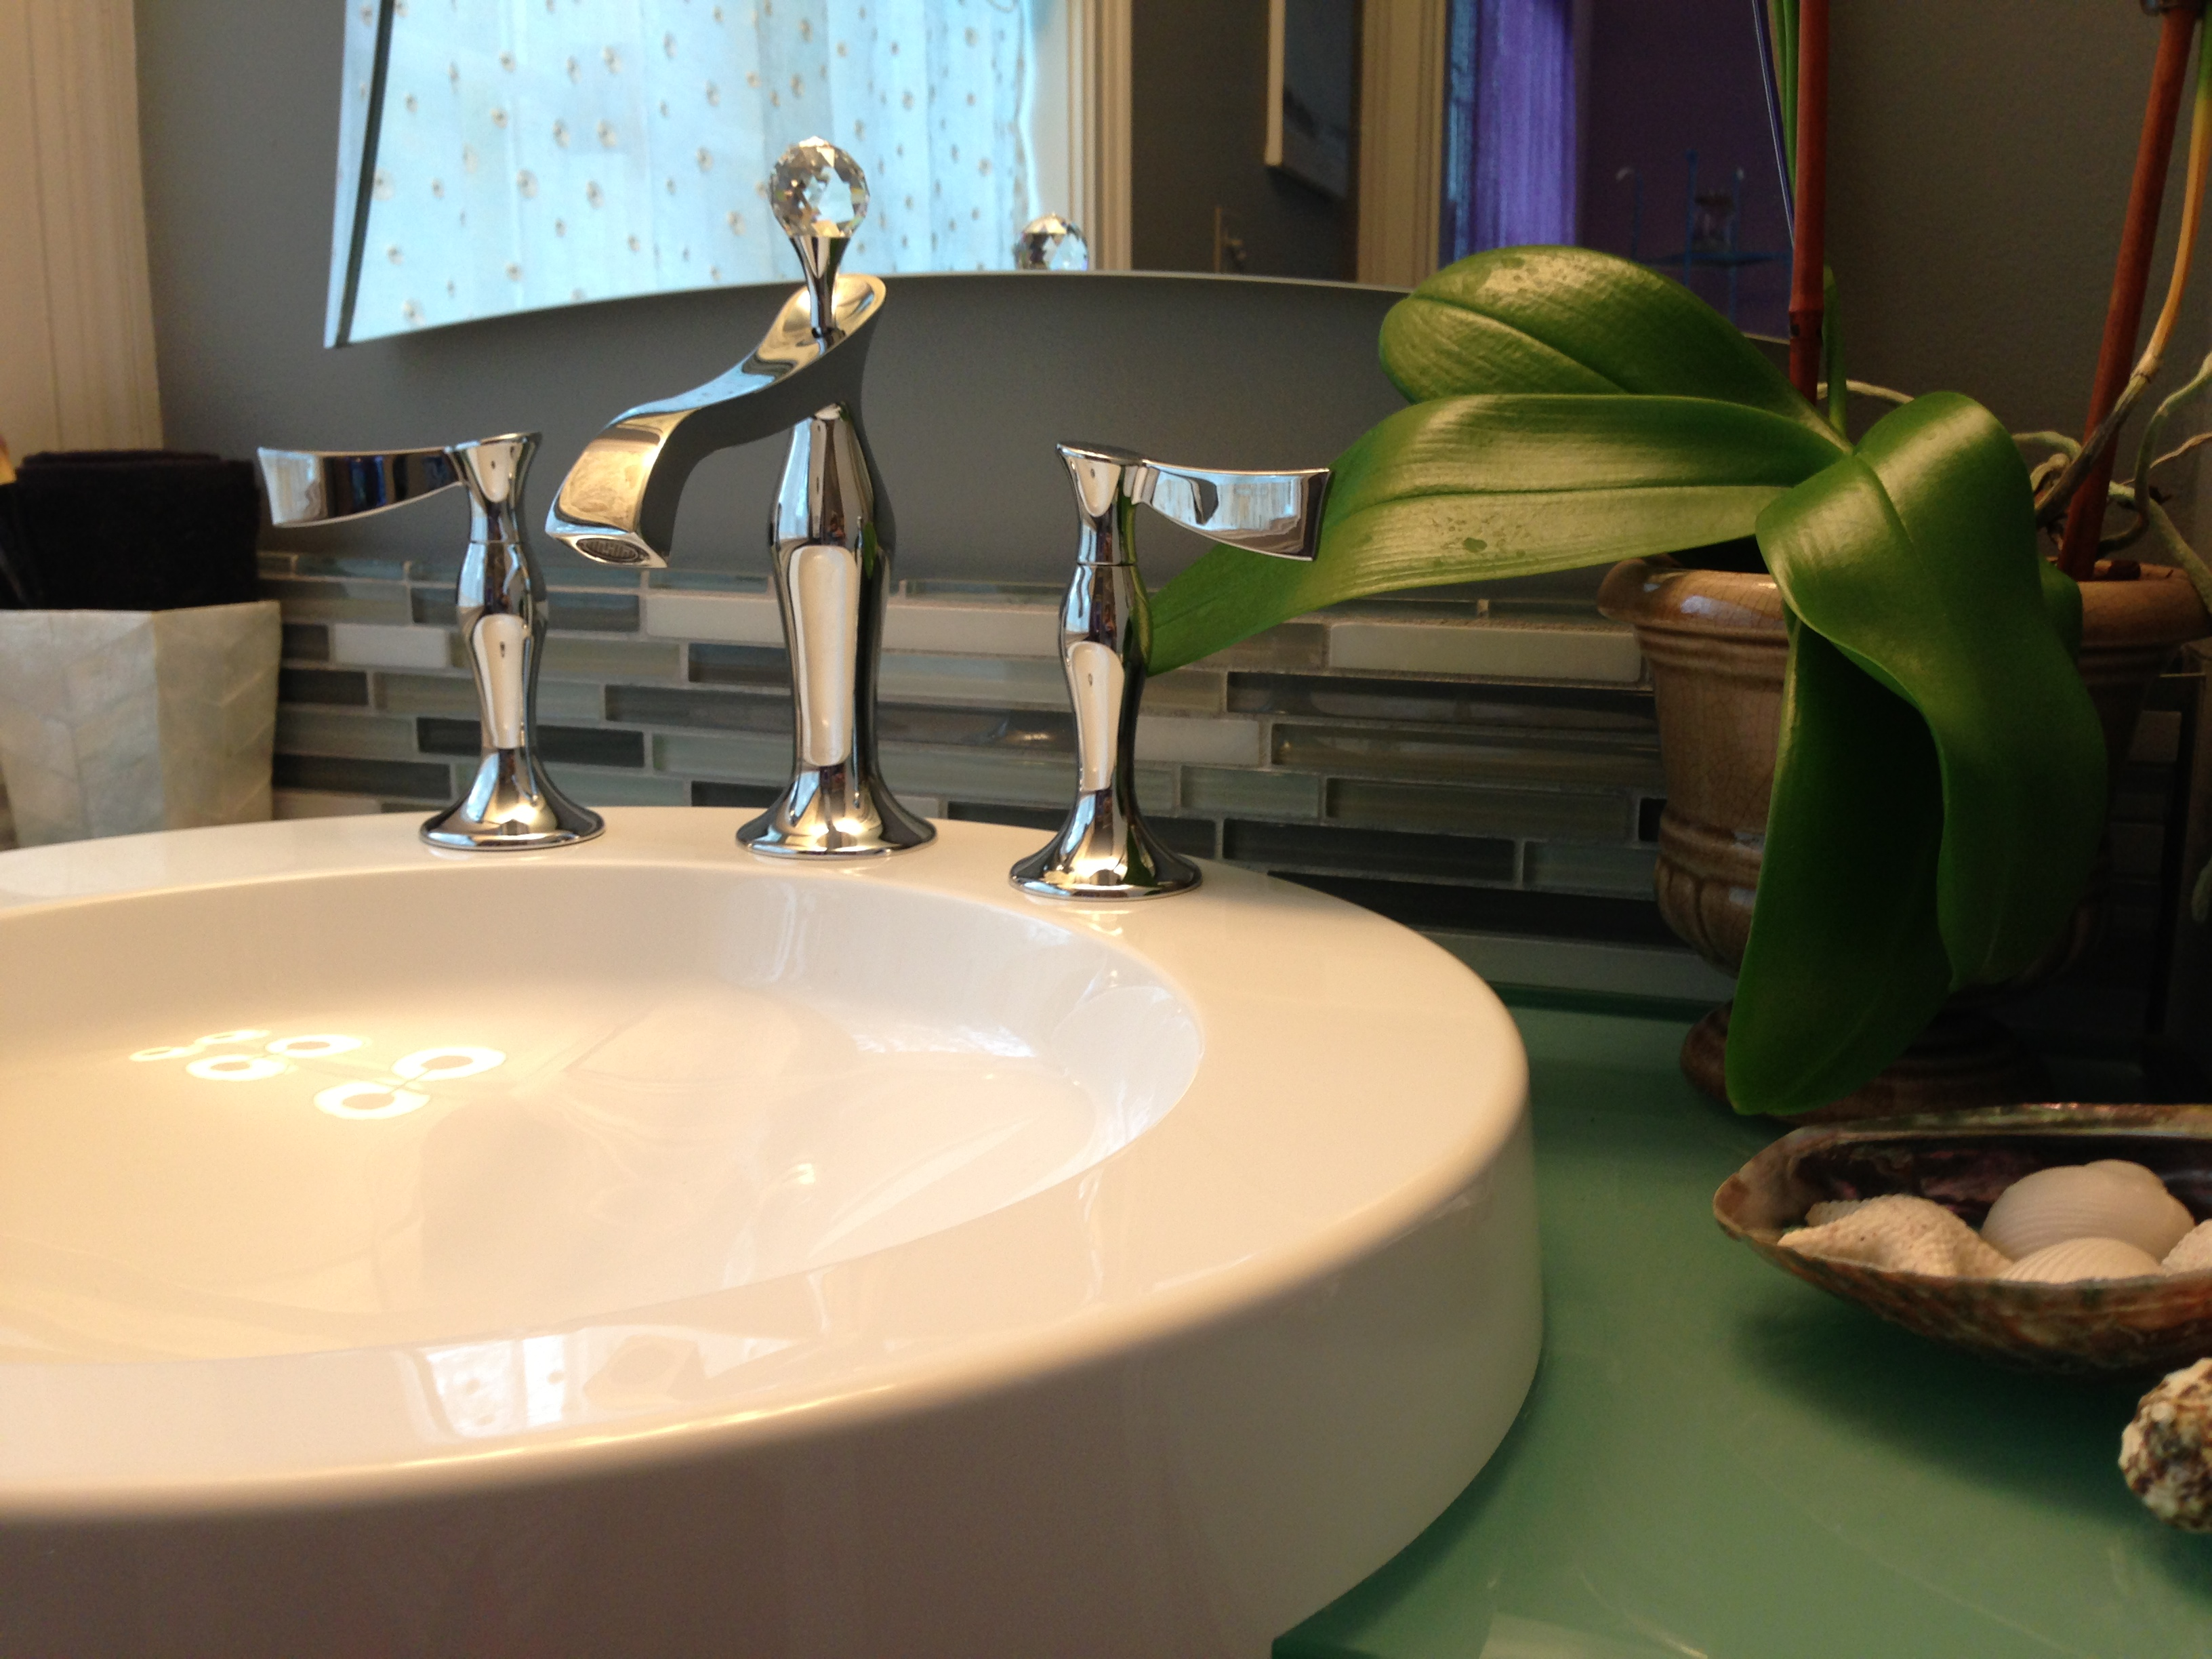 Secret Cove Show House 2013 - Syrena's Bath. Designer: Yvonne Blacker